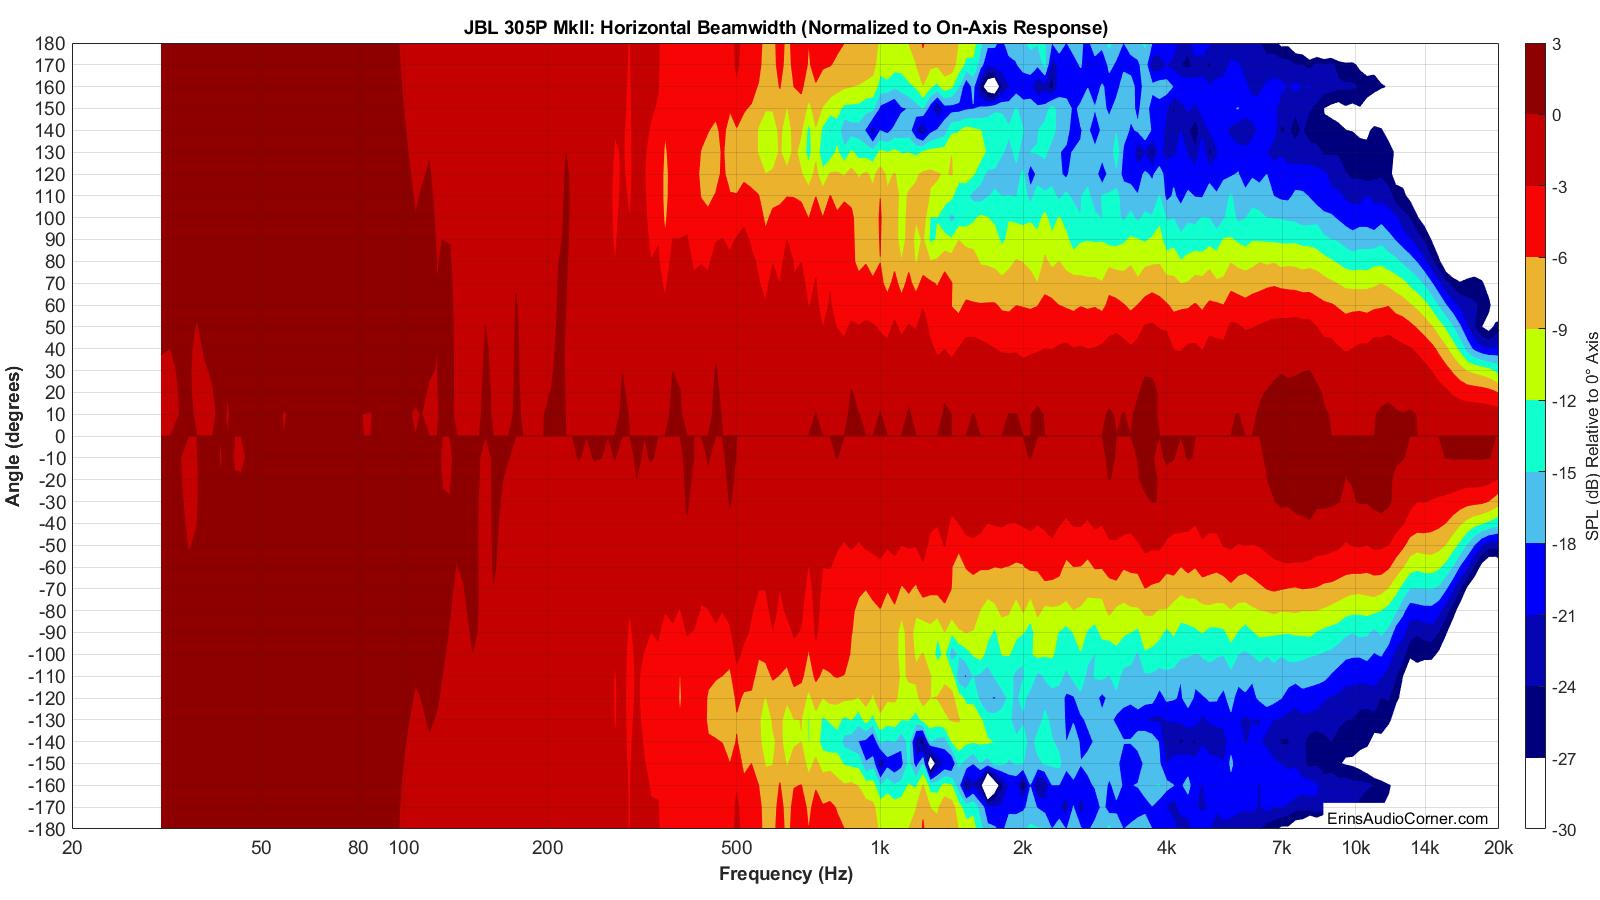 JBL%20305P%20MkII%20Beamwidth_Horizontal.png